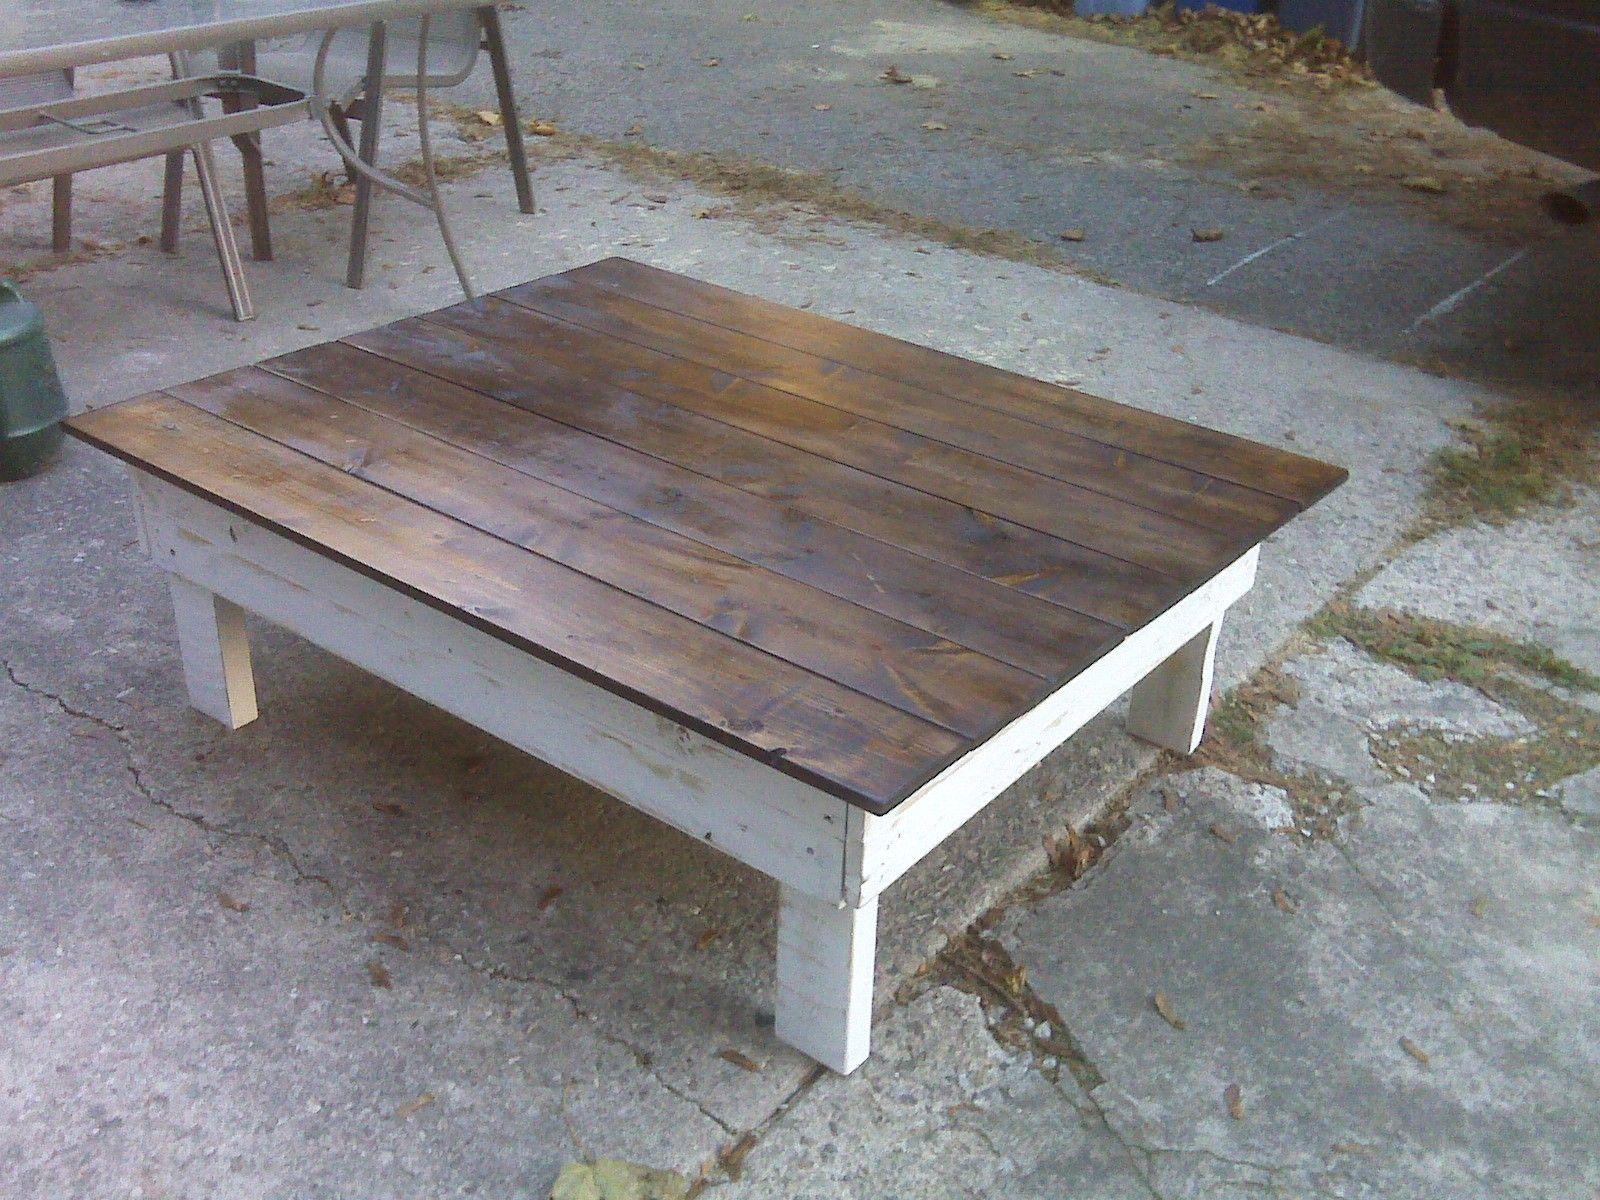 Pallet Coffee Table 4u0027 x 3u0027 x